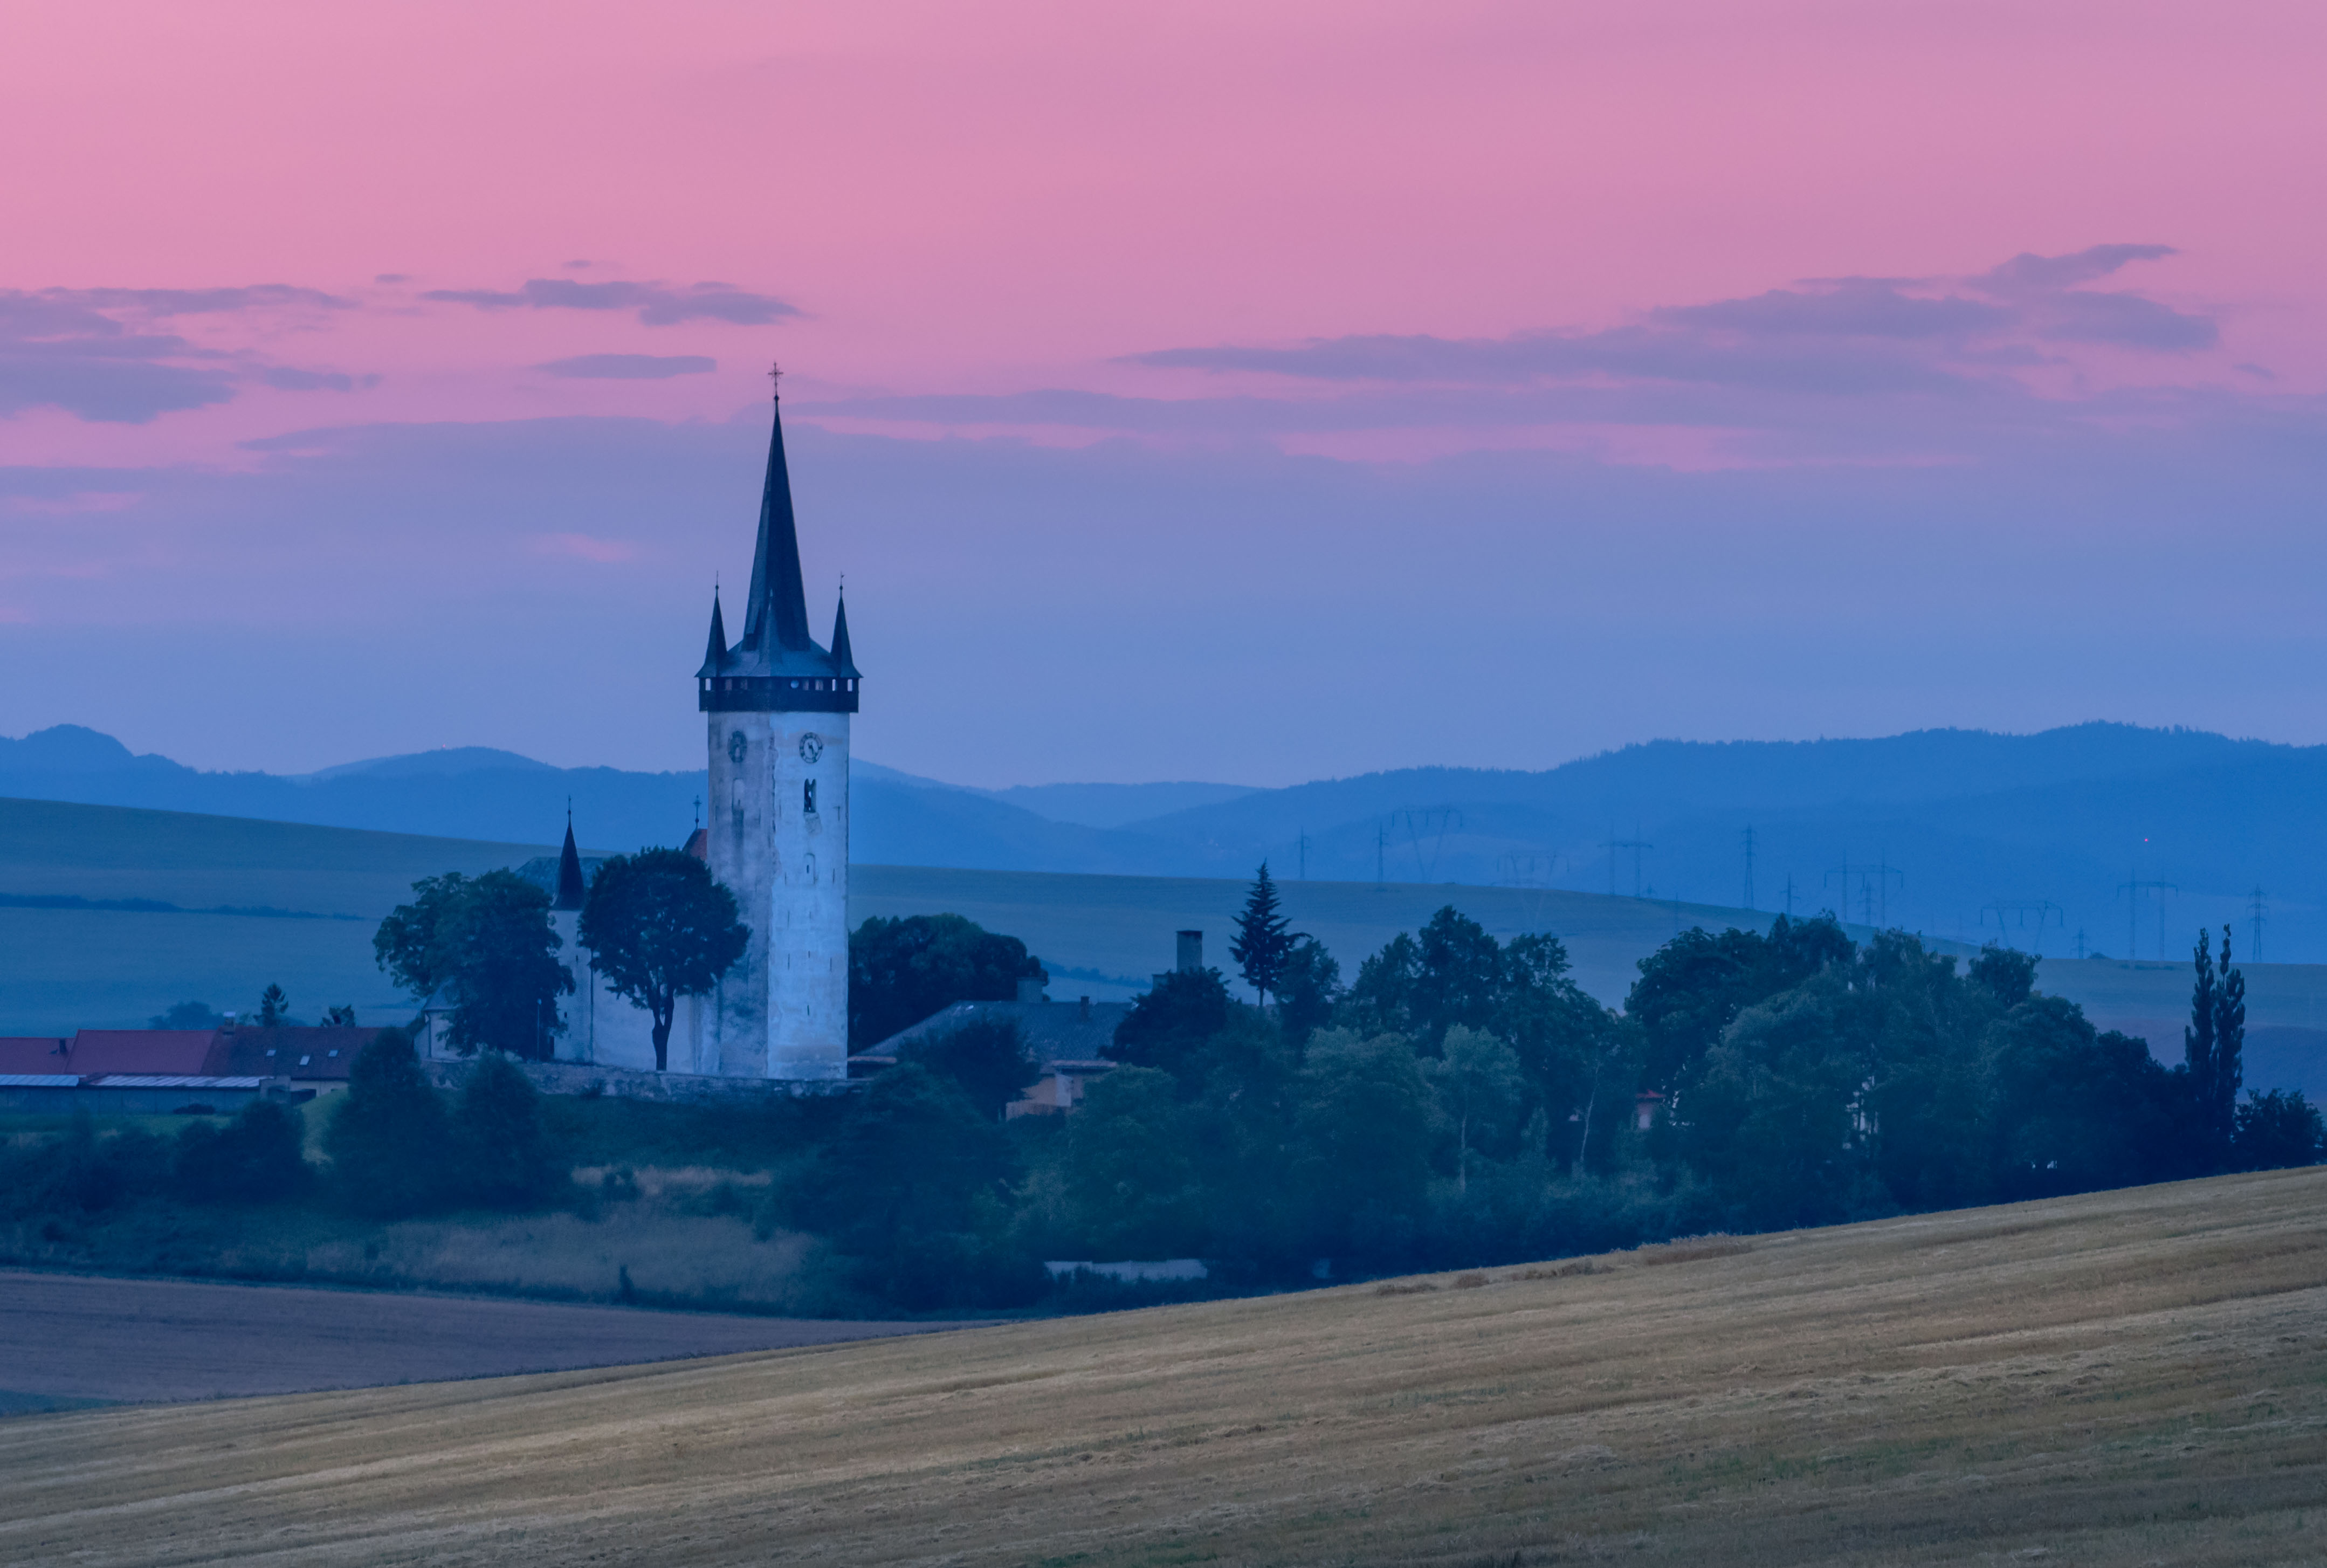 Spis region, Slovakia